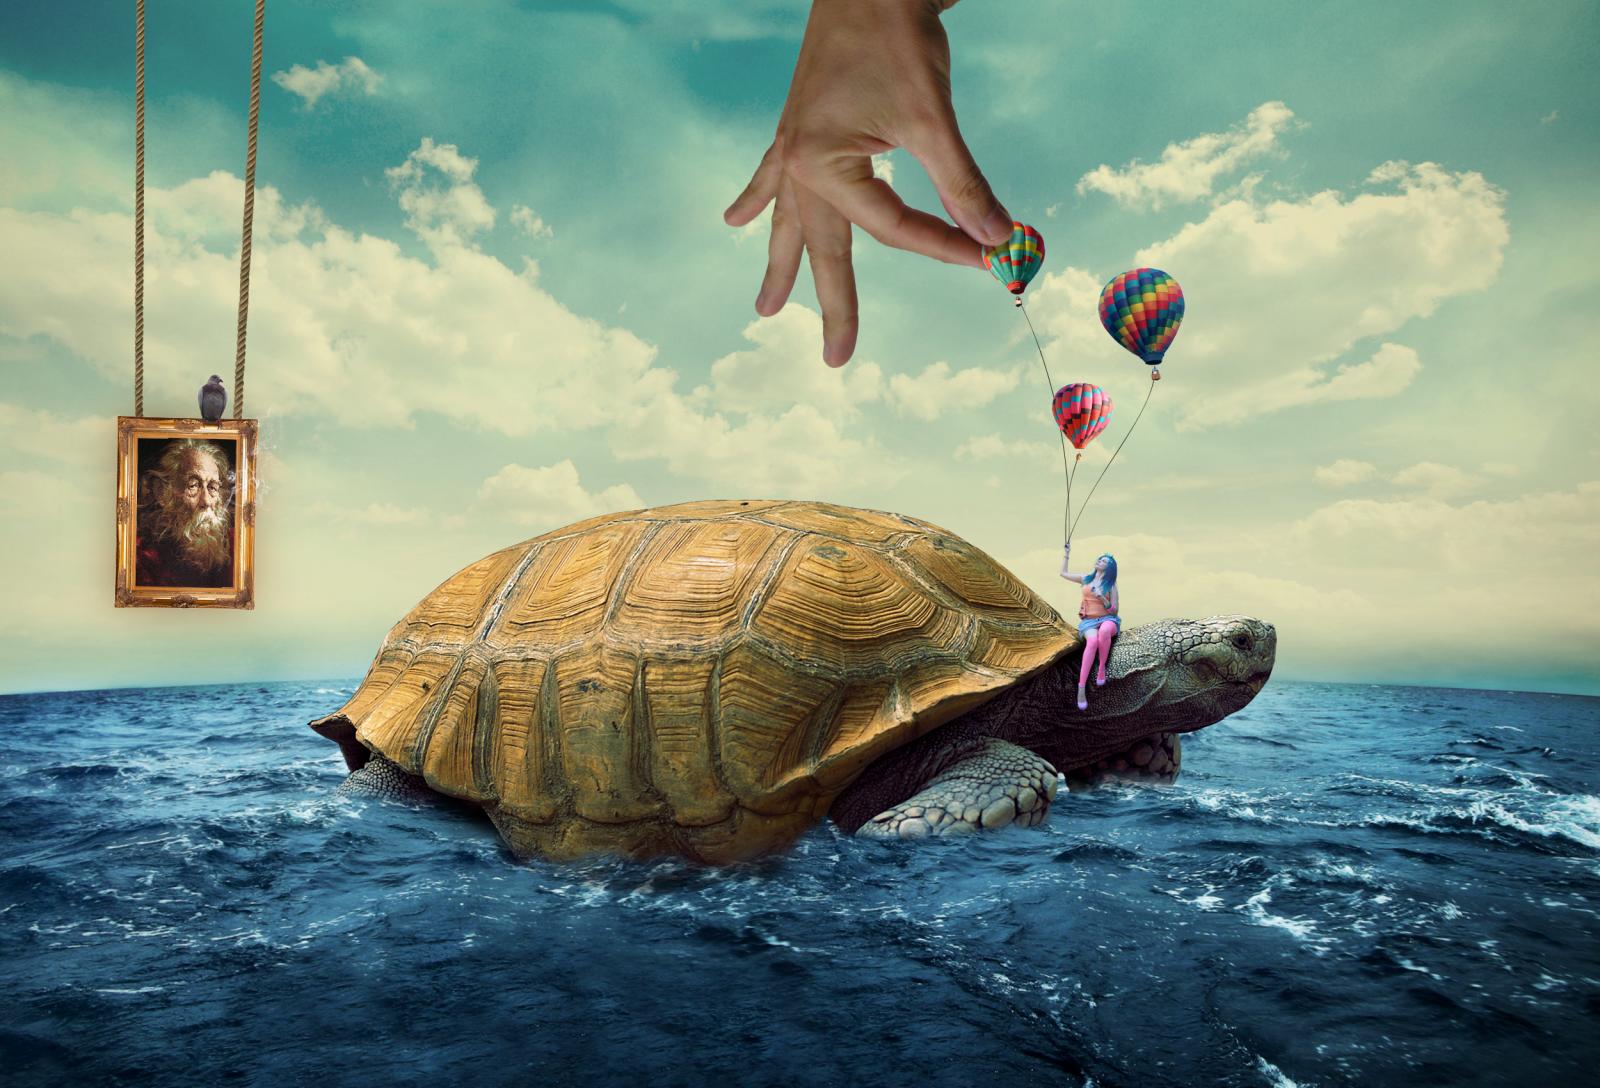 Wallpaper  Digital Art, Artwork, Surreal, Animals, Sea